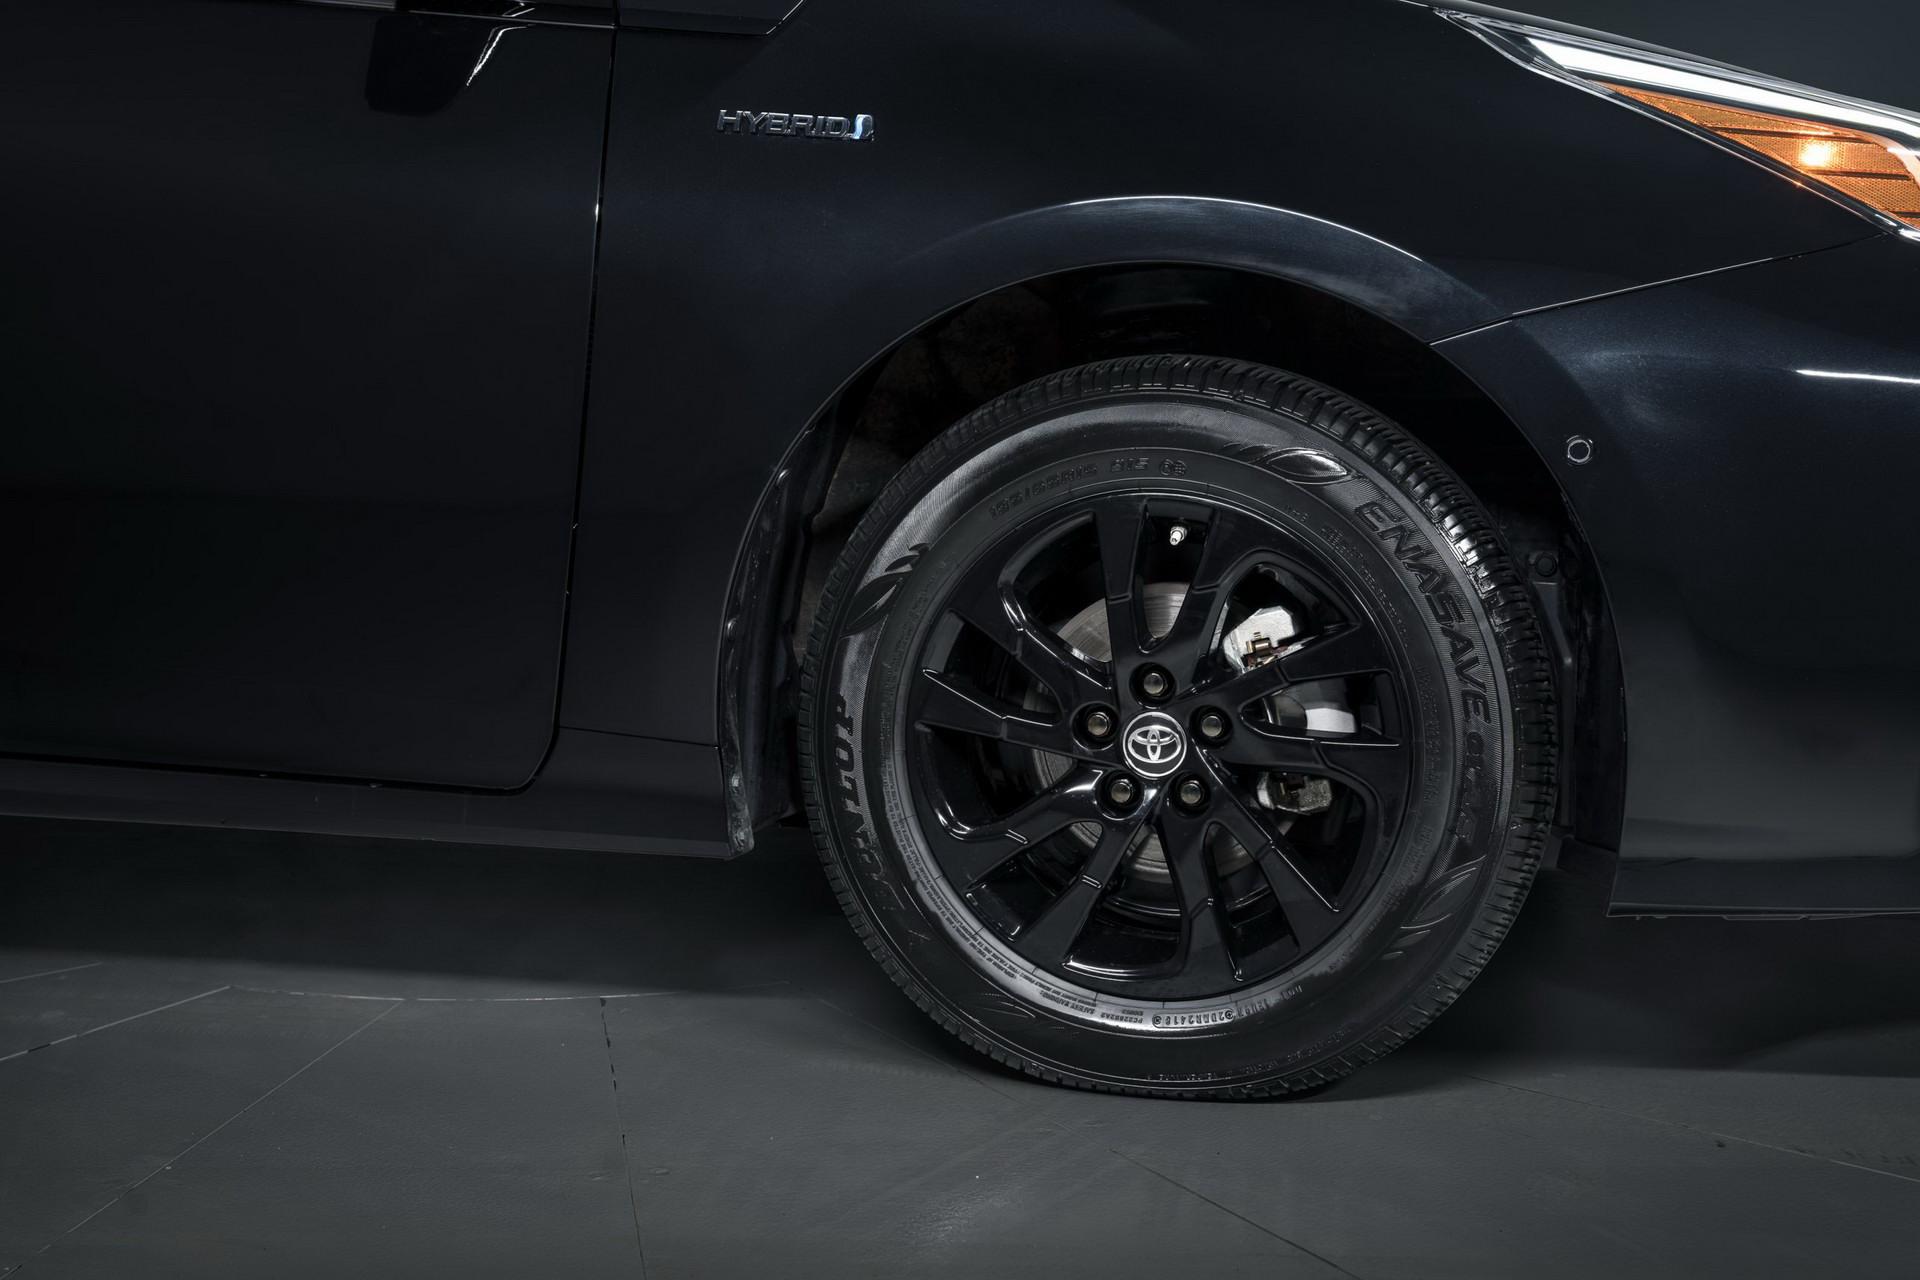 Toyota-Prius-Nightshade-Edition-15